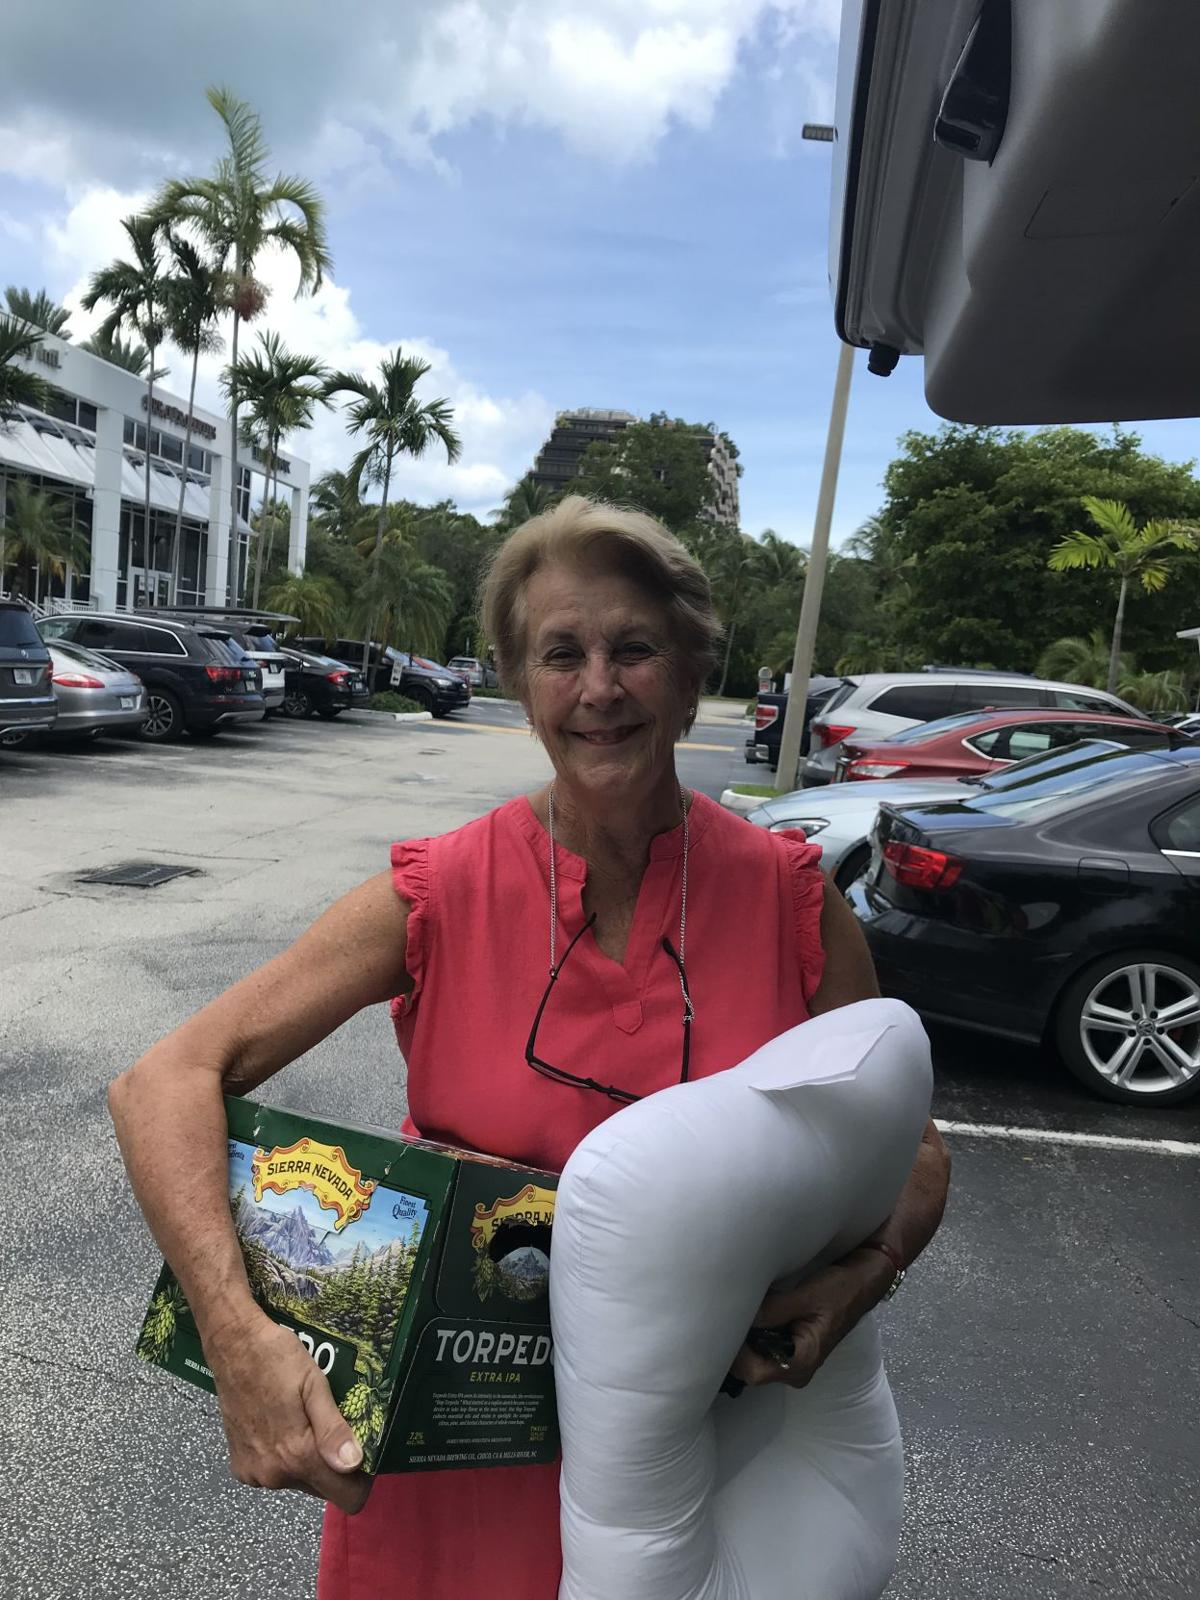 Elena Deschabelles unloads her donations of non-preservable food